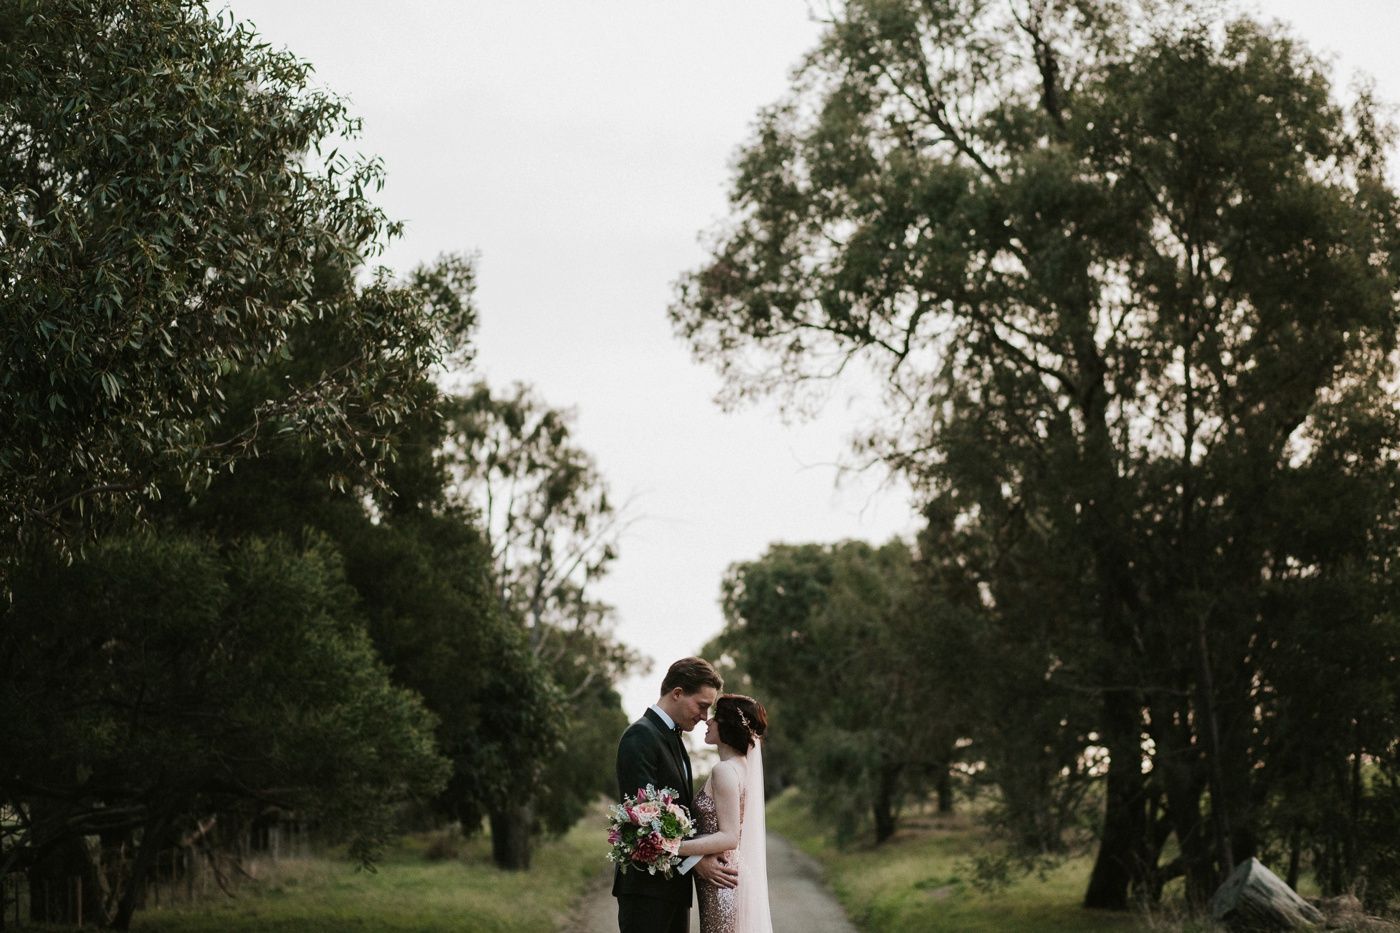 Emma&Morgan_Melbourne-Vintage-Elegant-Fun-Quirky-Yarra-Valley-Vineyard-Wedding_Melbourne-Wedding-Photography-73